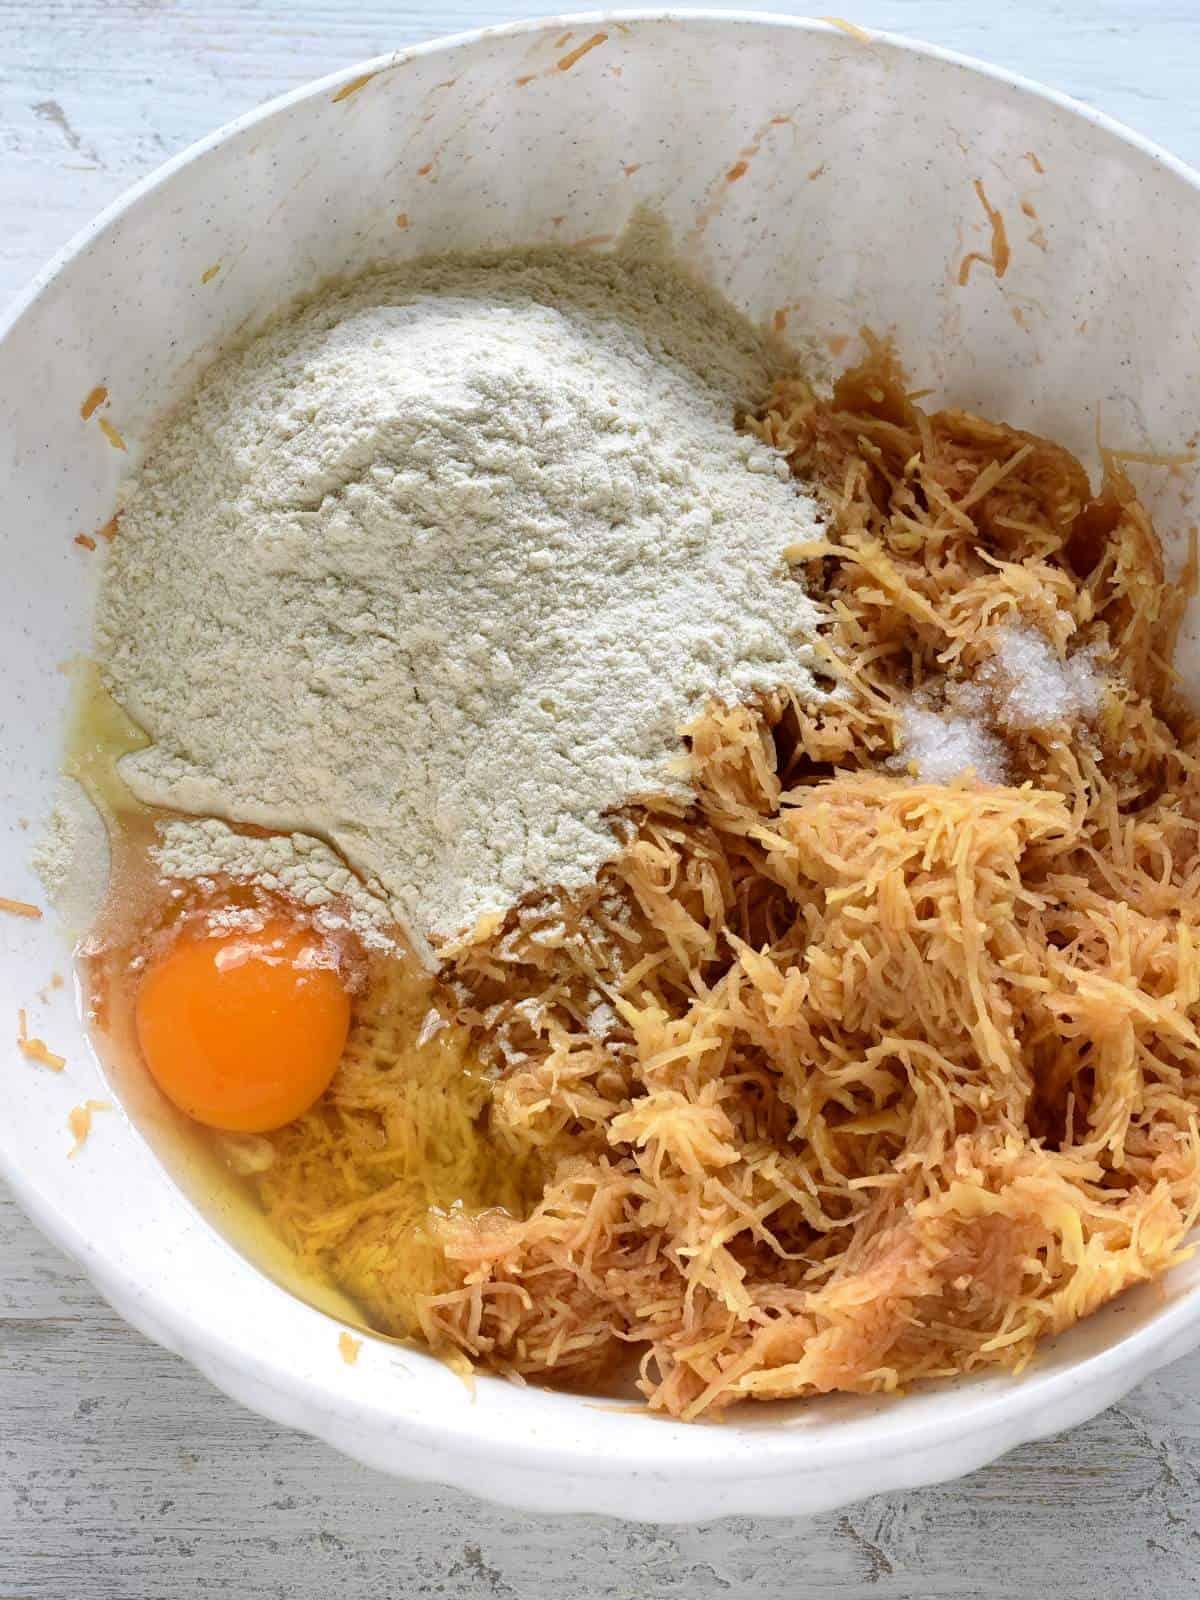 making chlupate knedliky dough